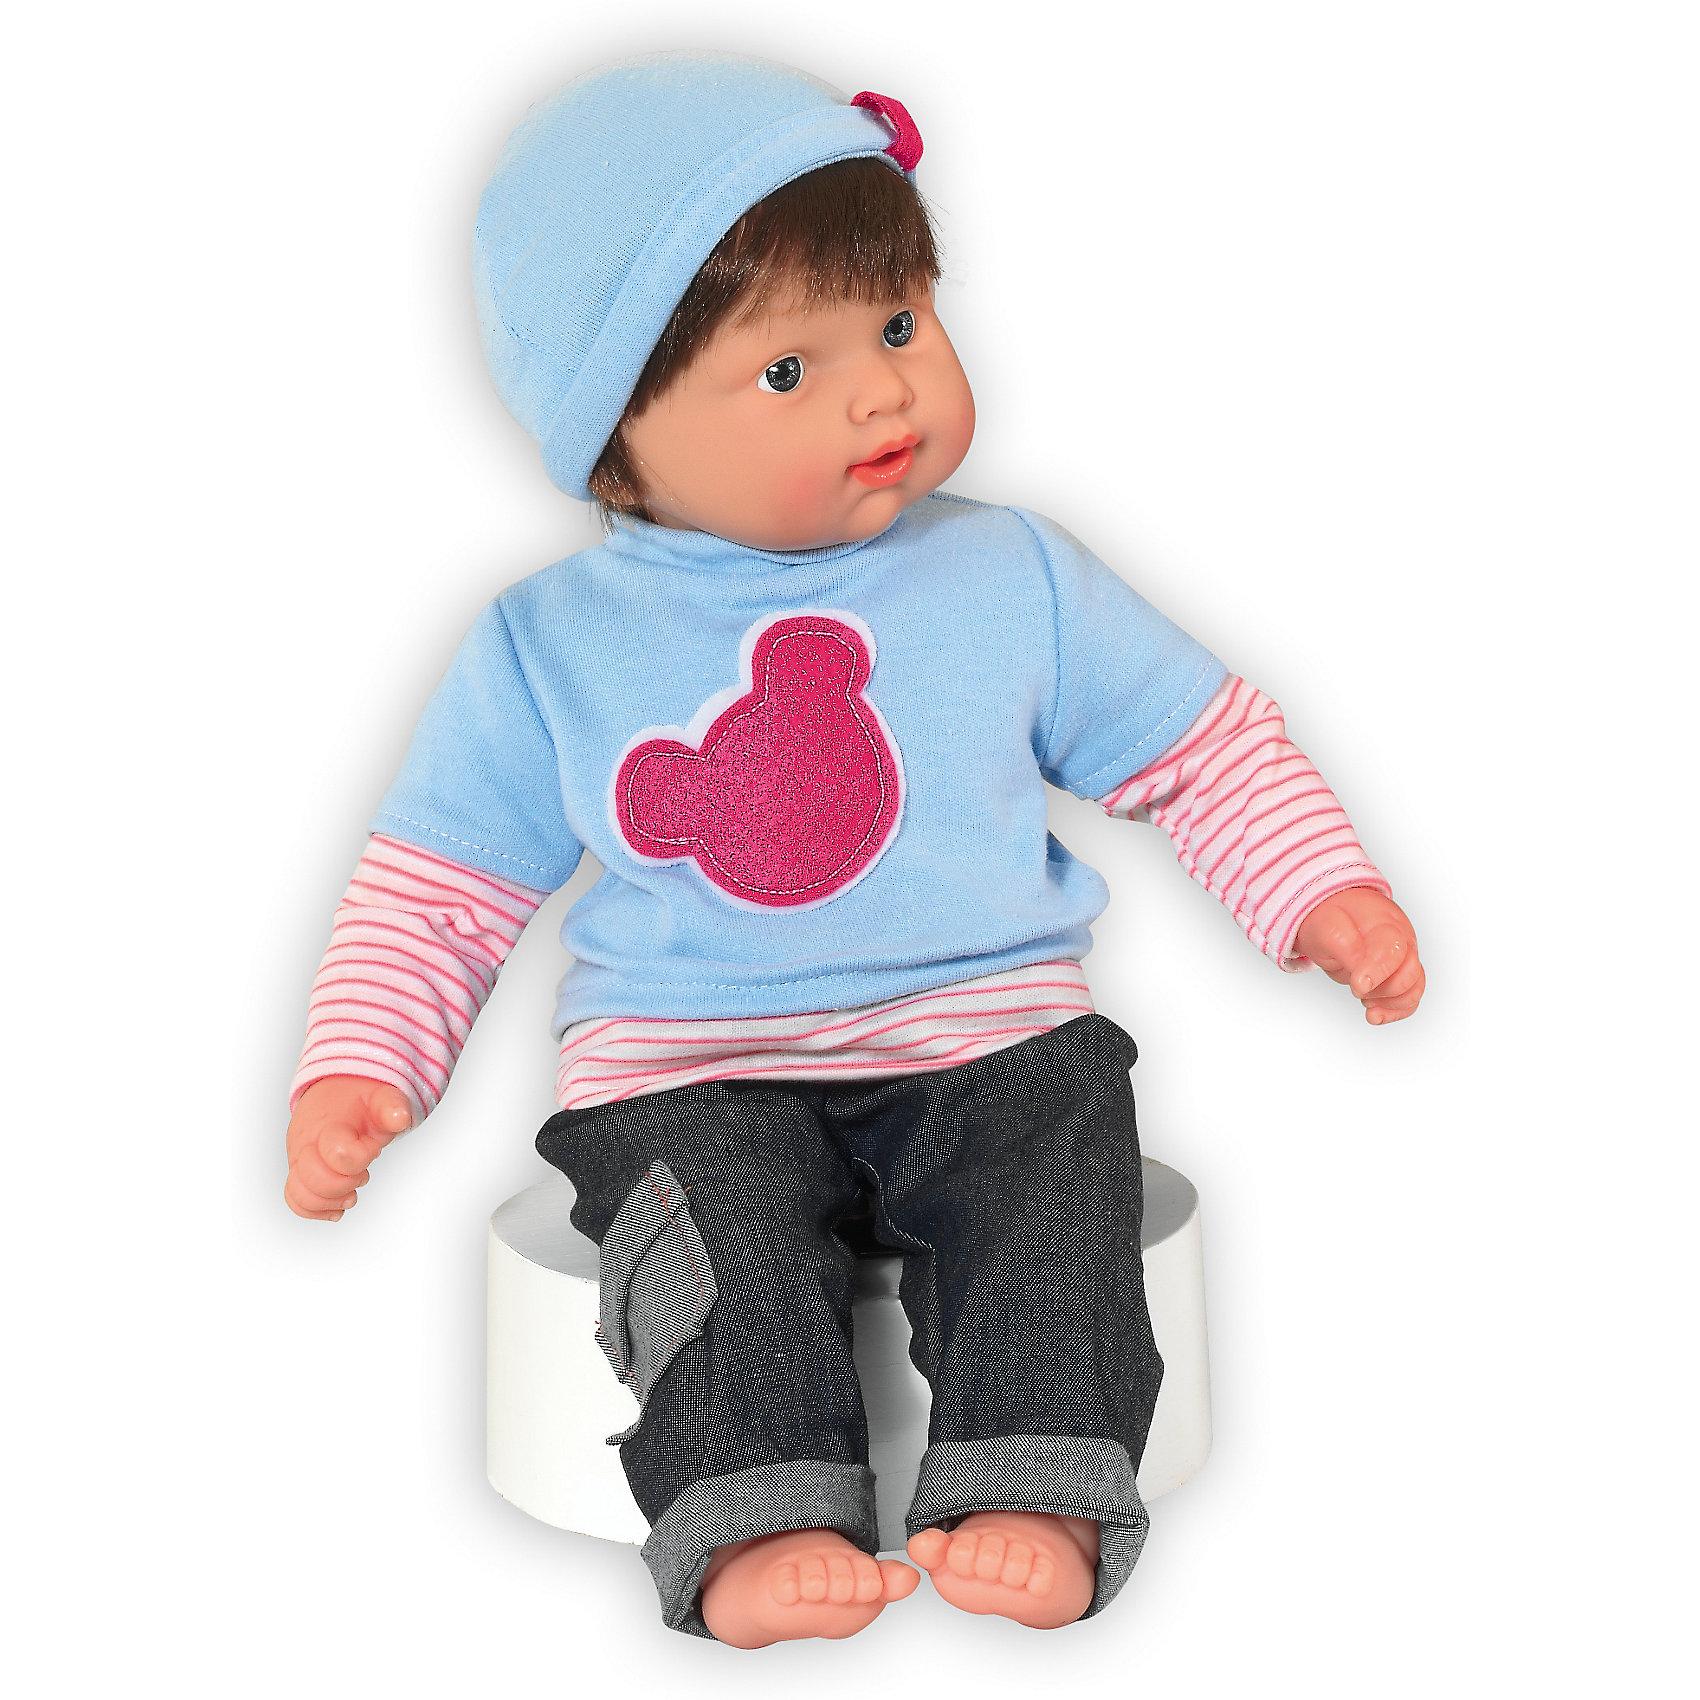 Кукла Baby Pink Мальчик, Loko ToysКлассические куклы<br><br><br>Ширина мм: 330<br>Глубина мм: 125<br>Высота мм: 440<br>Вес г: 855<br>Возраст от месяцев: 10<br>Возраст до месяцев: 2147483647<br>Пол: Женский<br>Возраст: Детский<br>SKU: 6759072